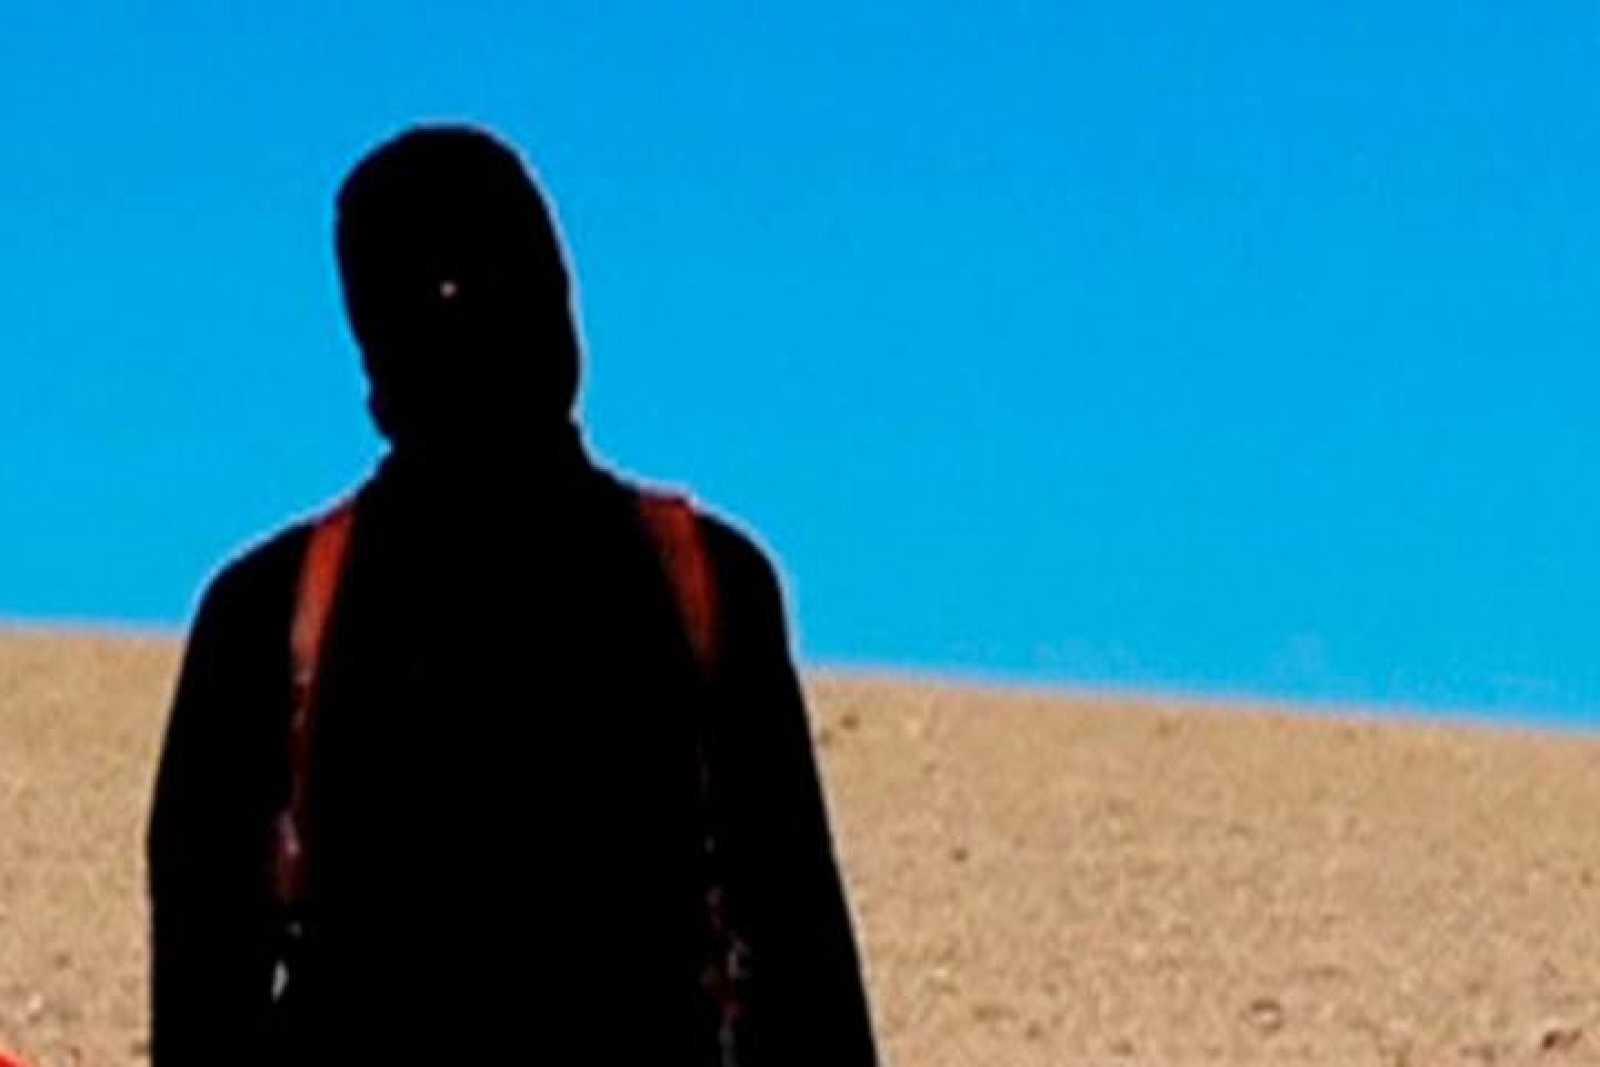 Capturan a dos yihadistas británicos acusados de matar a decenas de occidentales en Siria